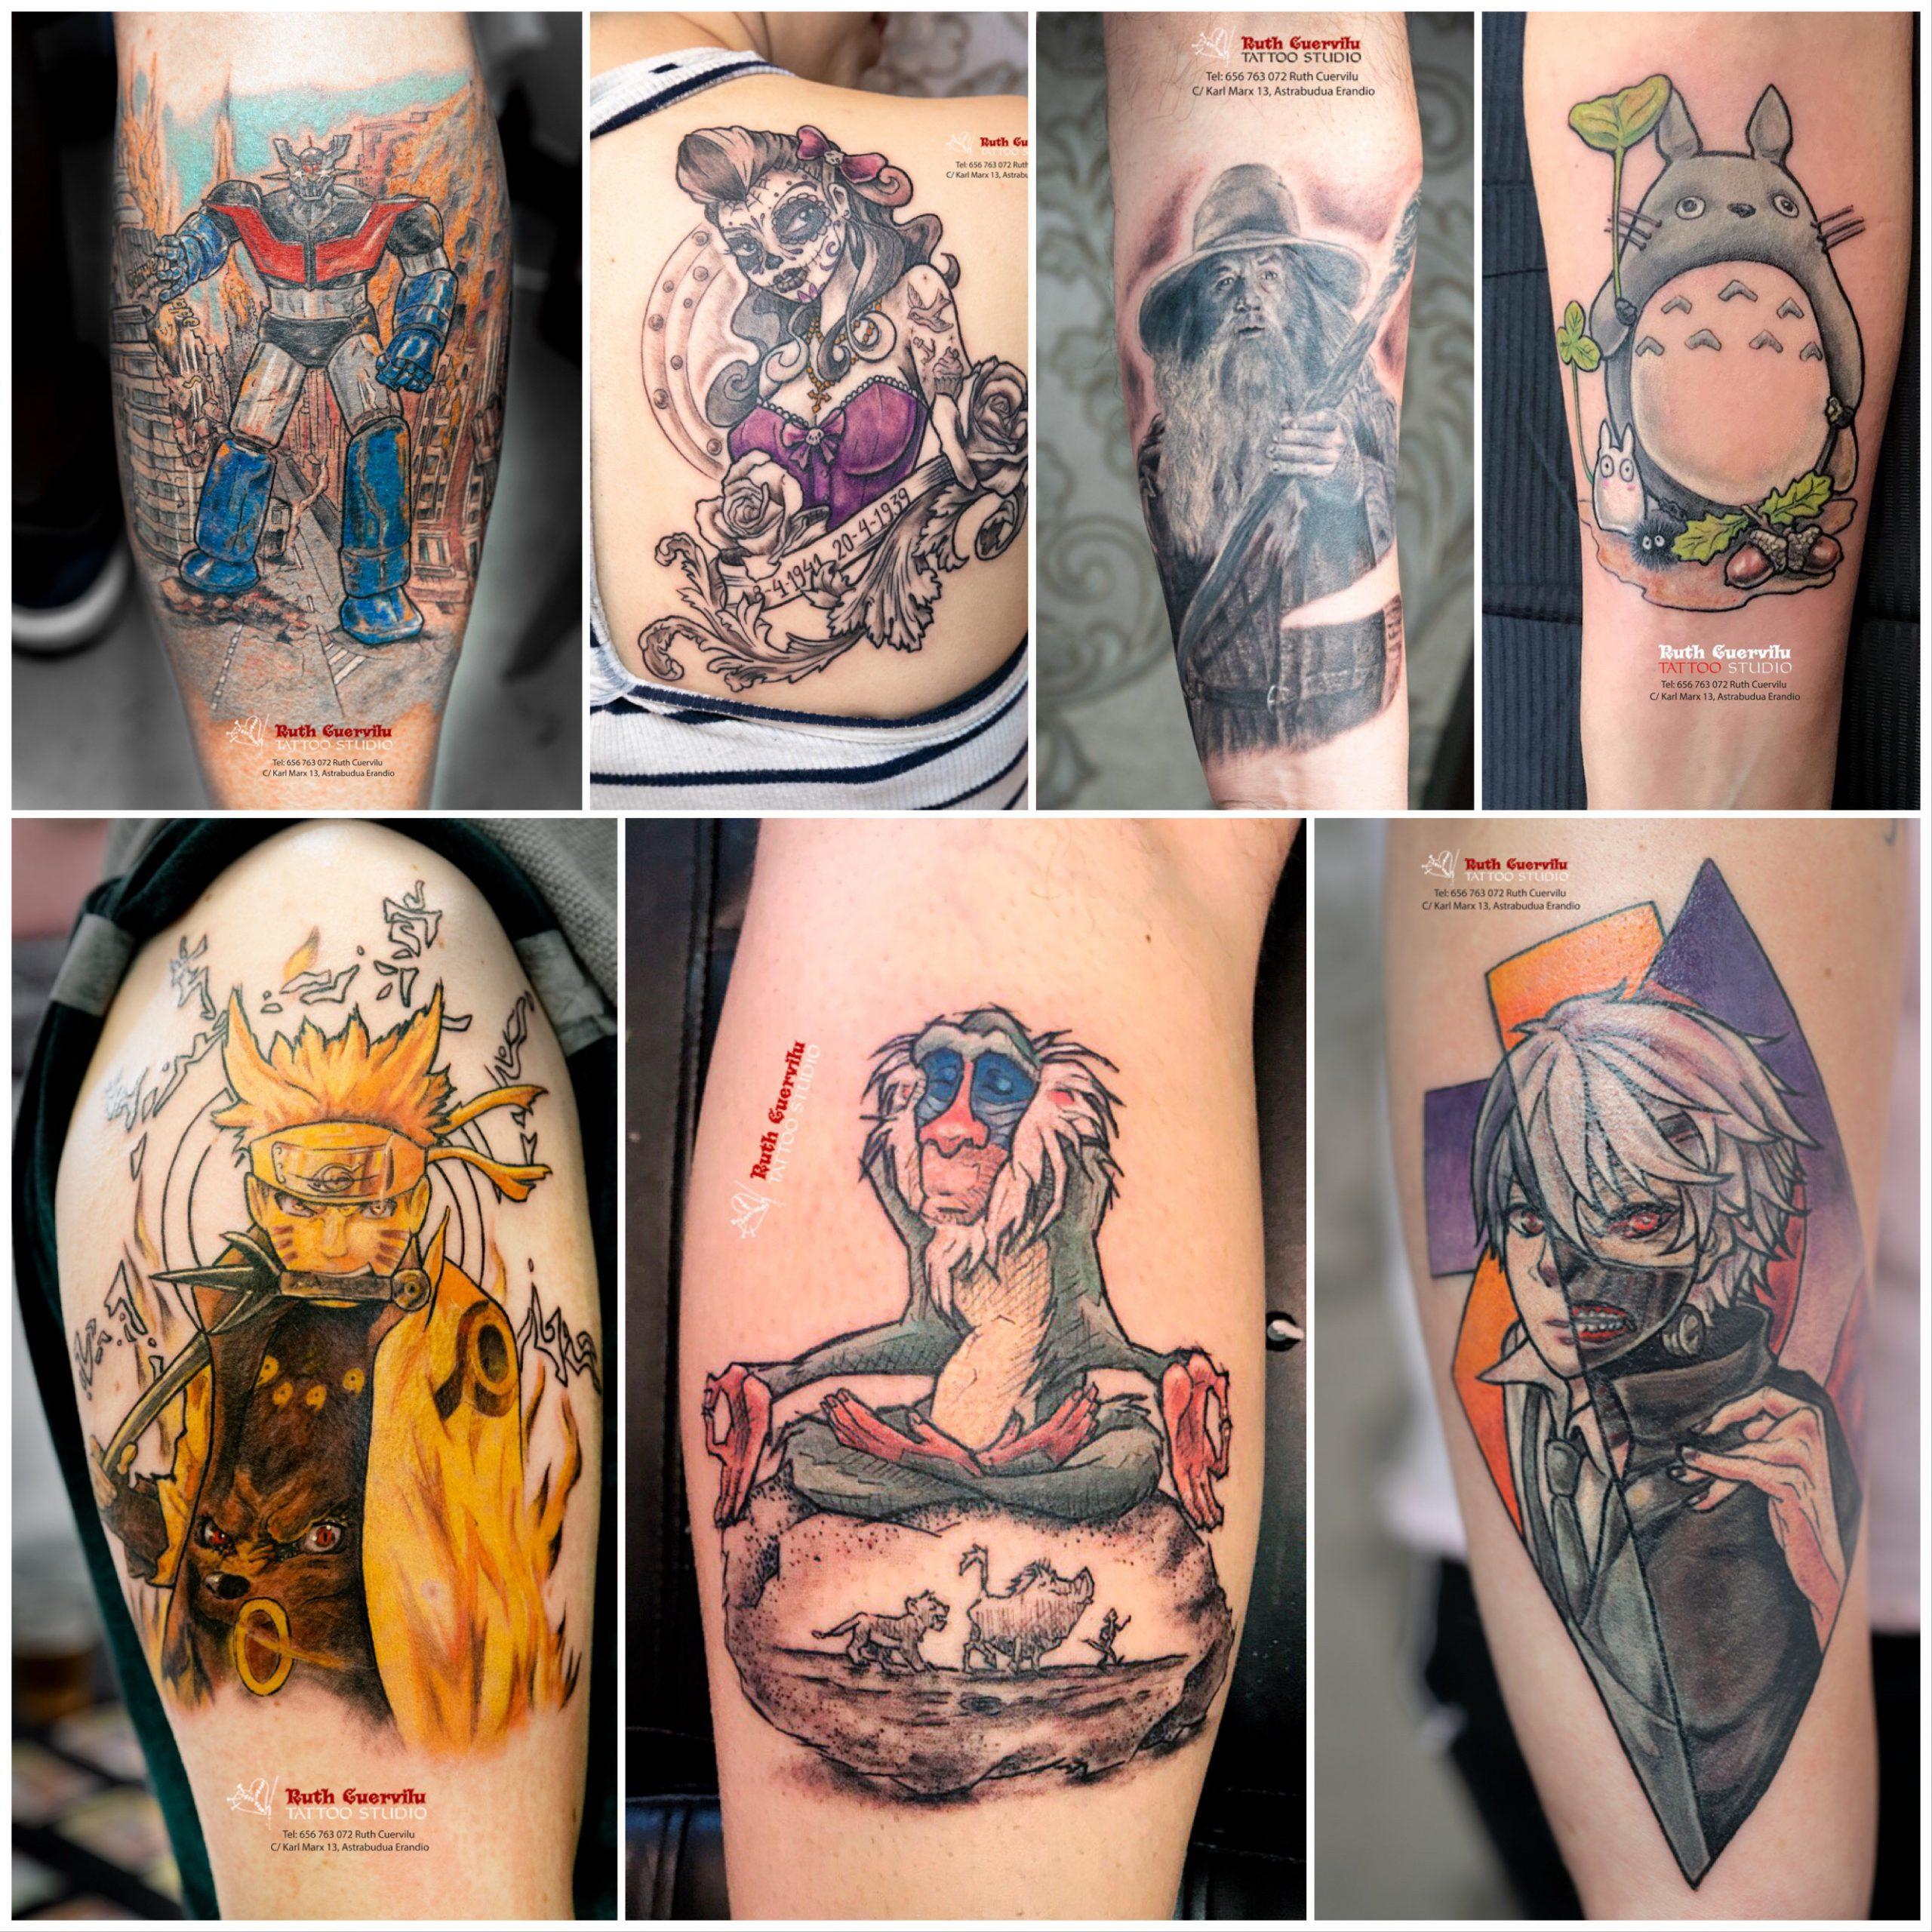 Tatuajes Anime, manga o cómic Ruth Cuervilu Tattoo